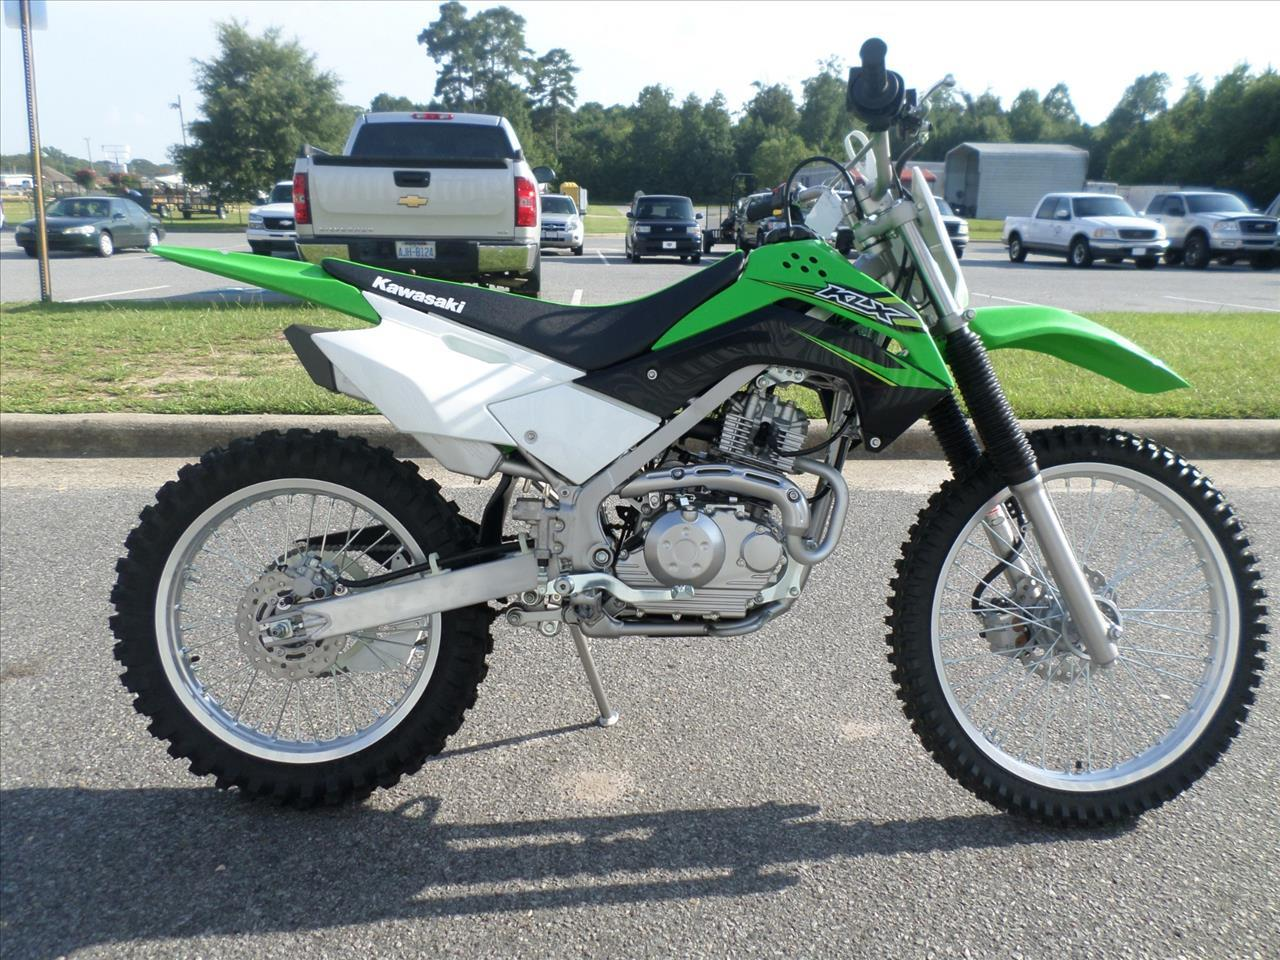 2017 Kawasaki KLX140G for sale at Vehicle Network, LLC - Ron Ayers Motorsports in Greenville NC